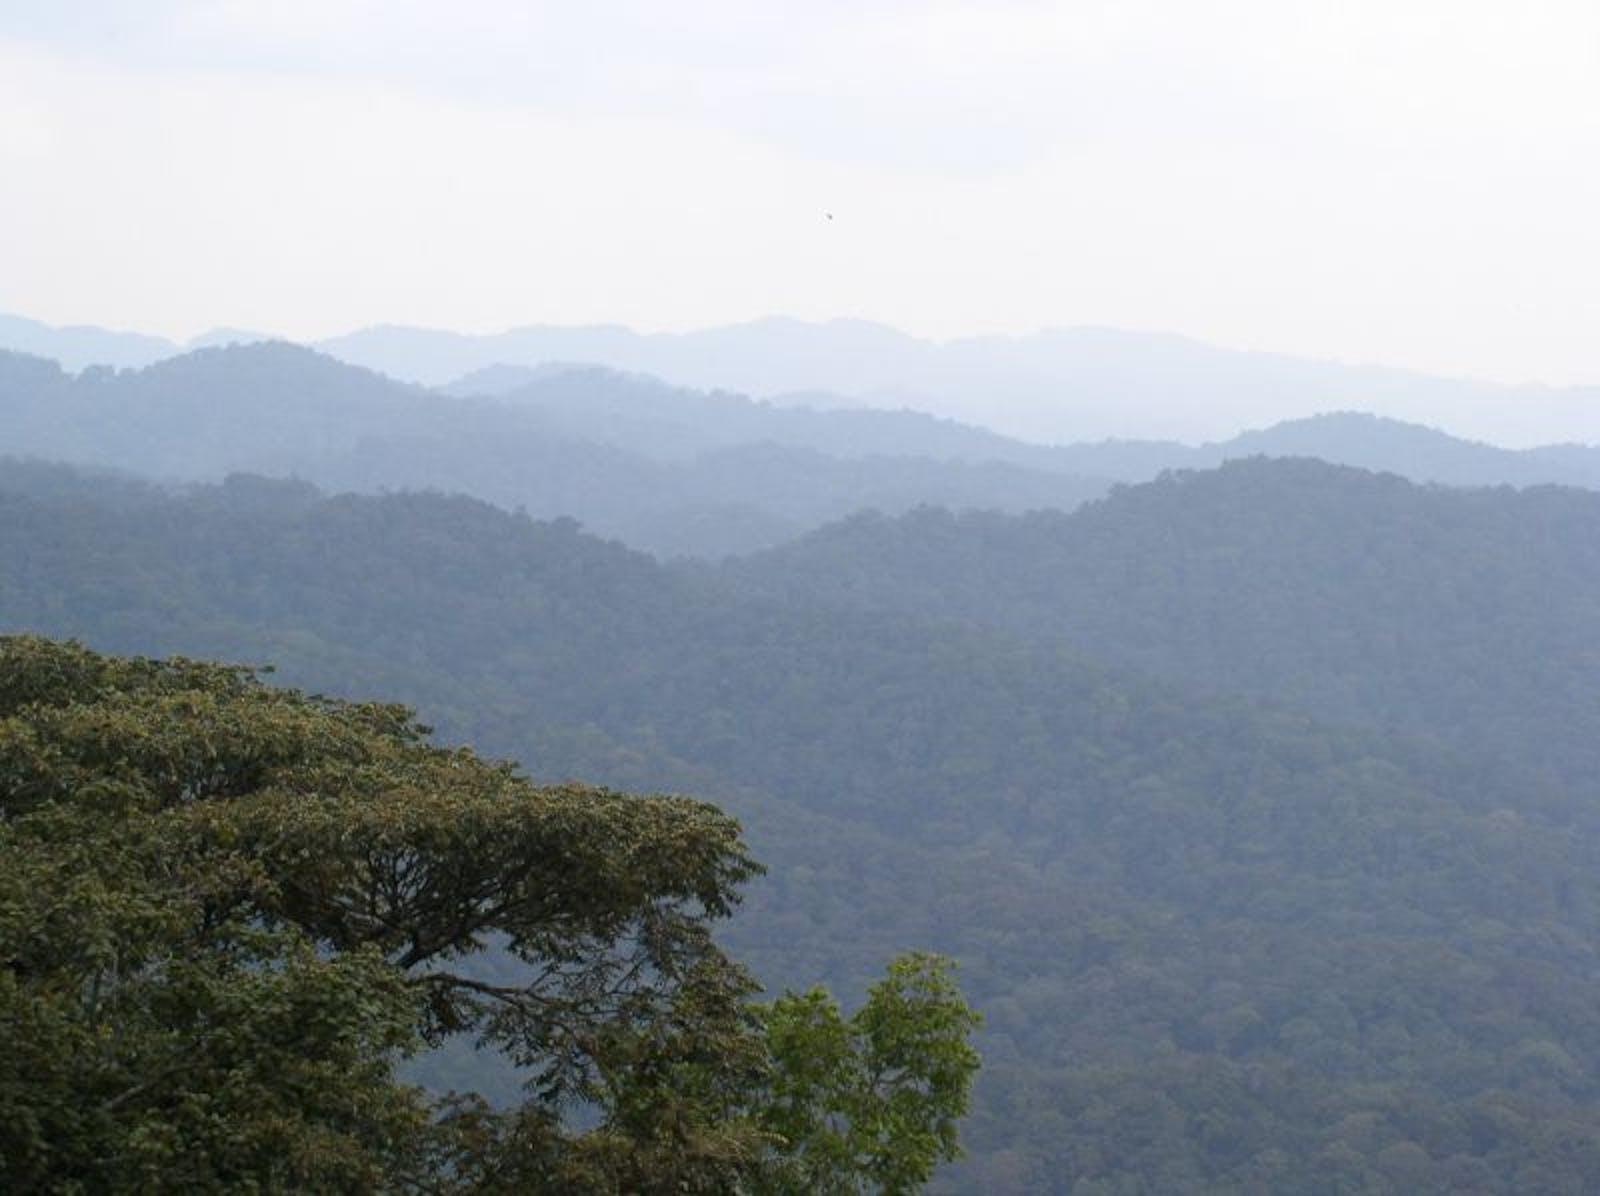 Albertine Rift Montane Forests